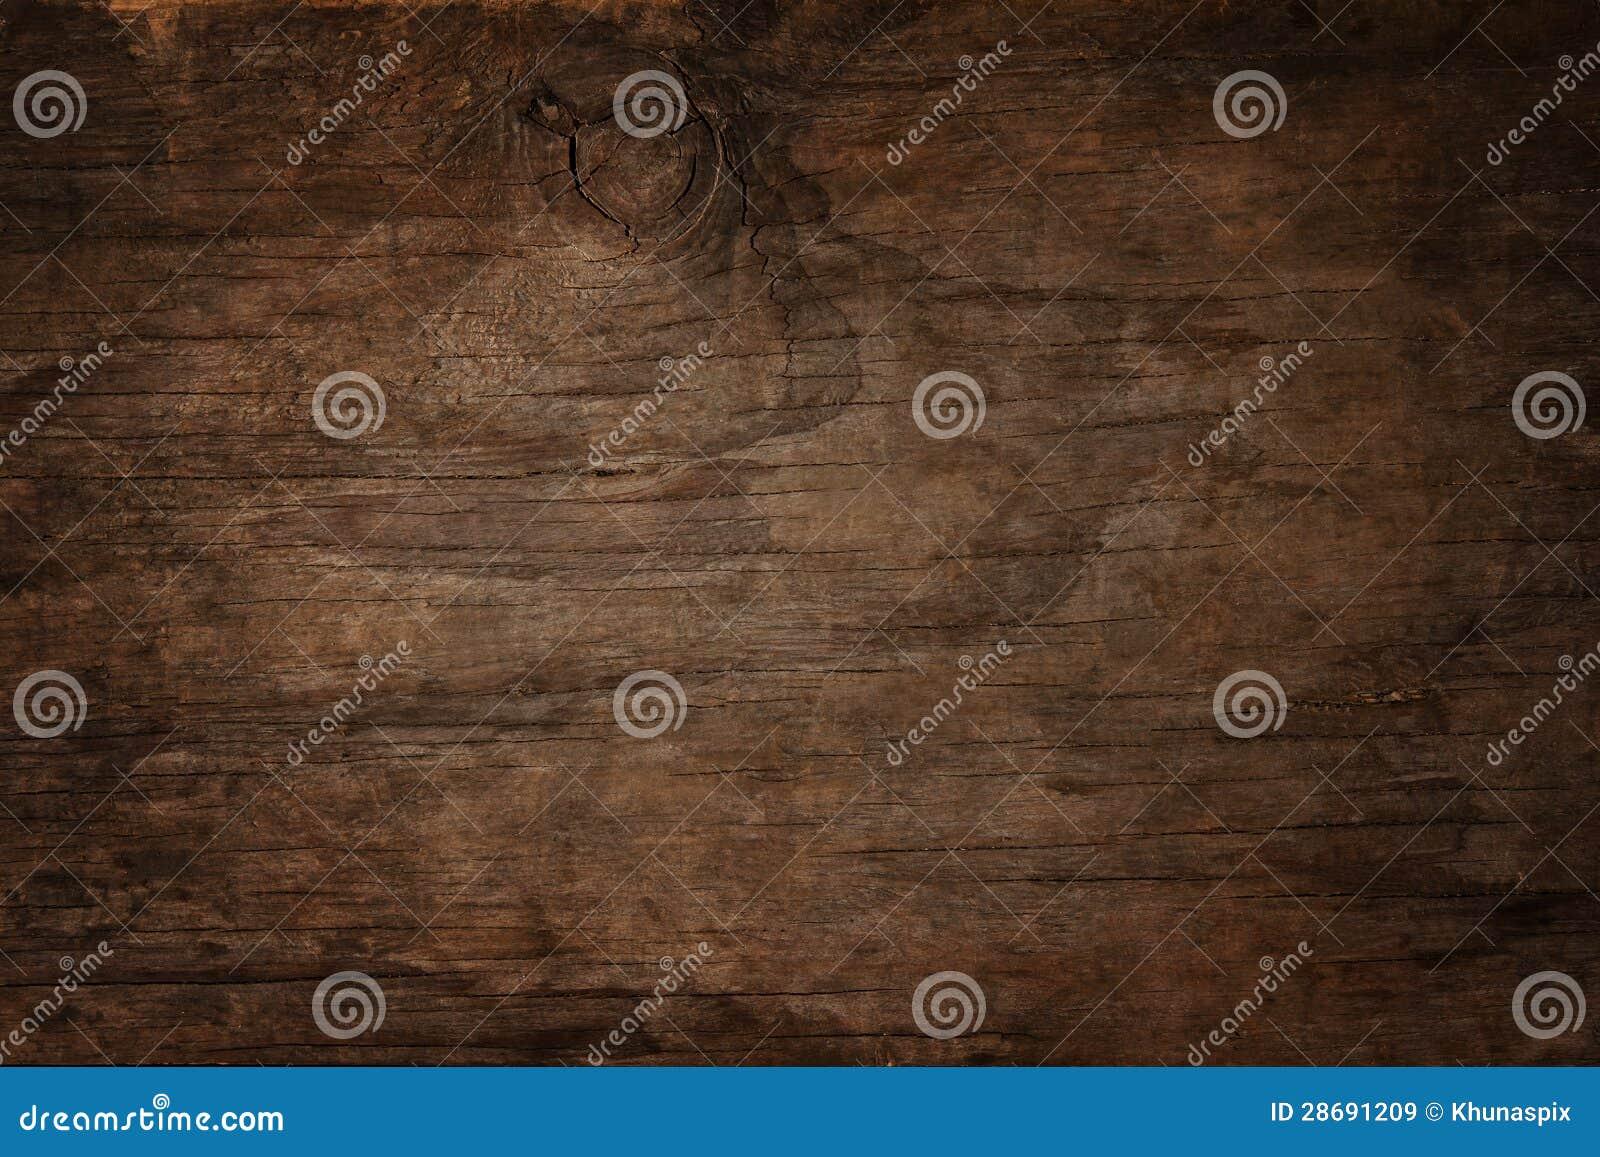 Textura del uso de madera de la corteza como fondo natural